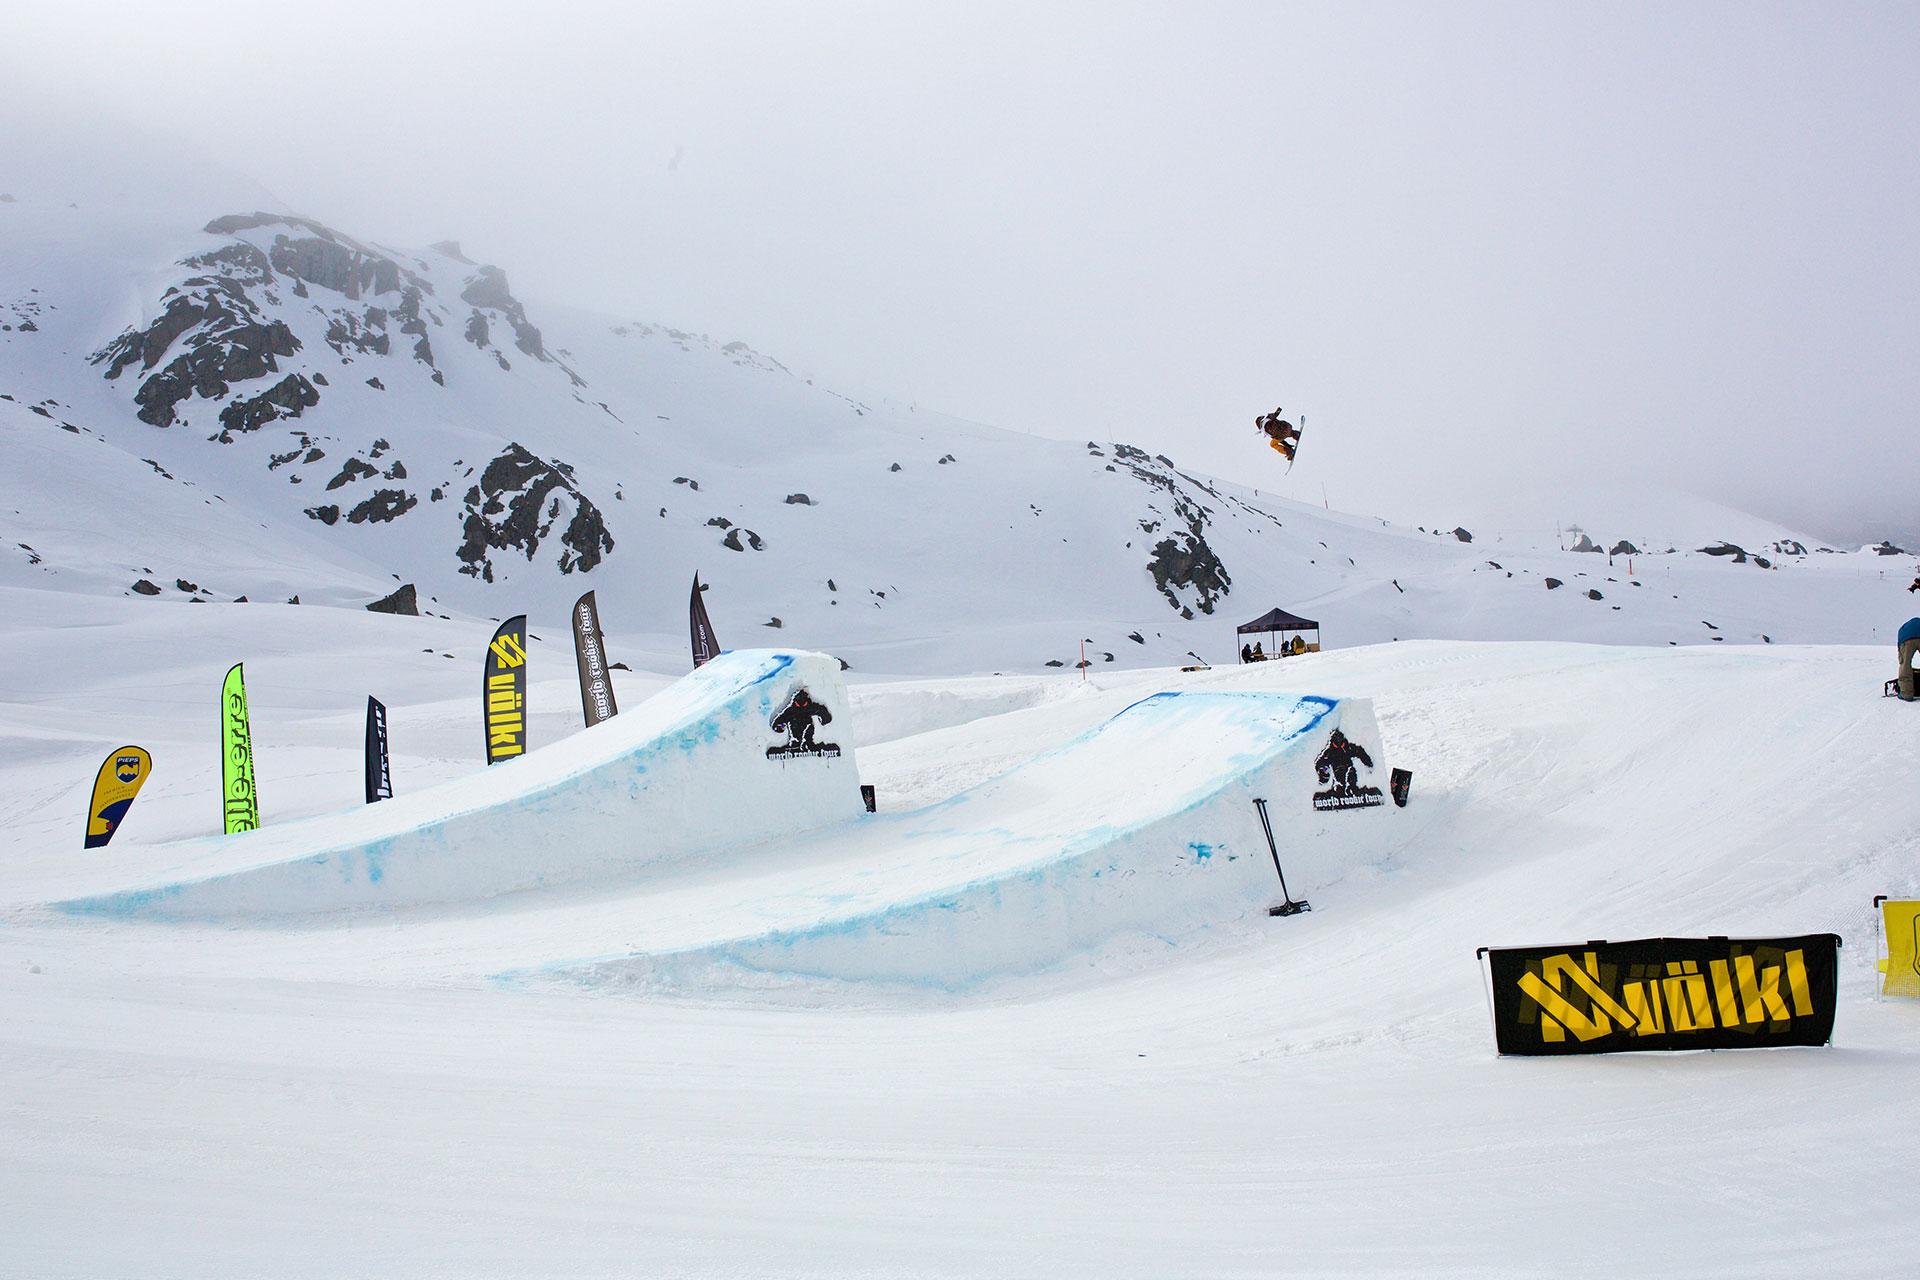 Prime-Snowboarding-Magazine-World-Rookie-Finale-2016-Kokomo-Murase-by-Gustav-Ohlsson